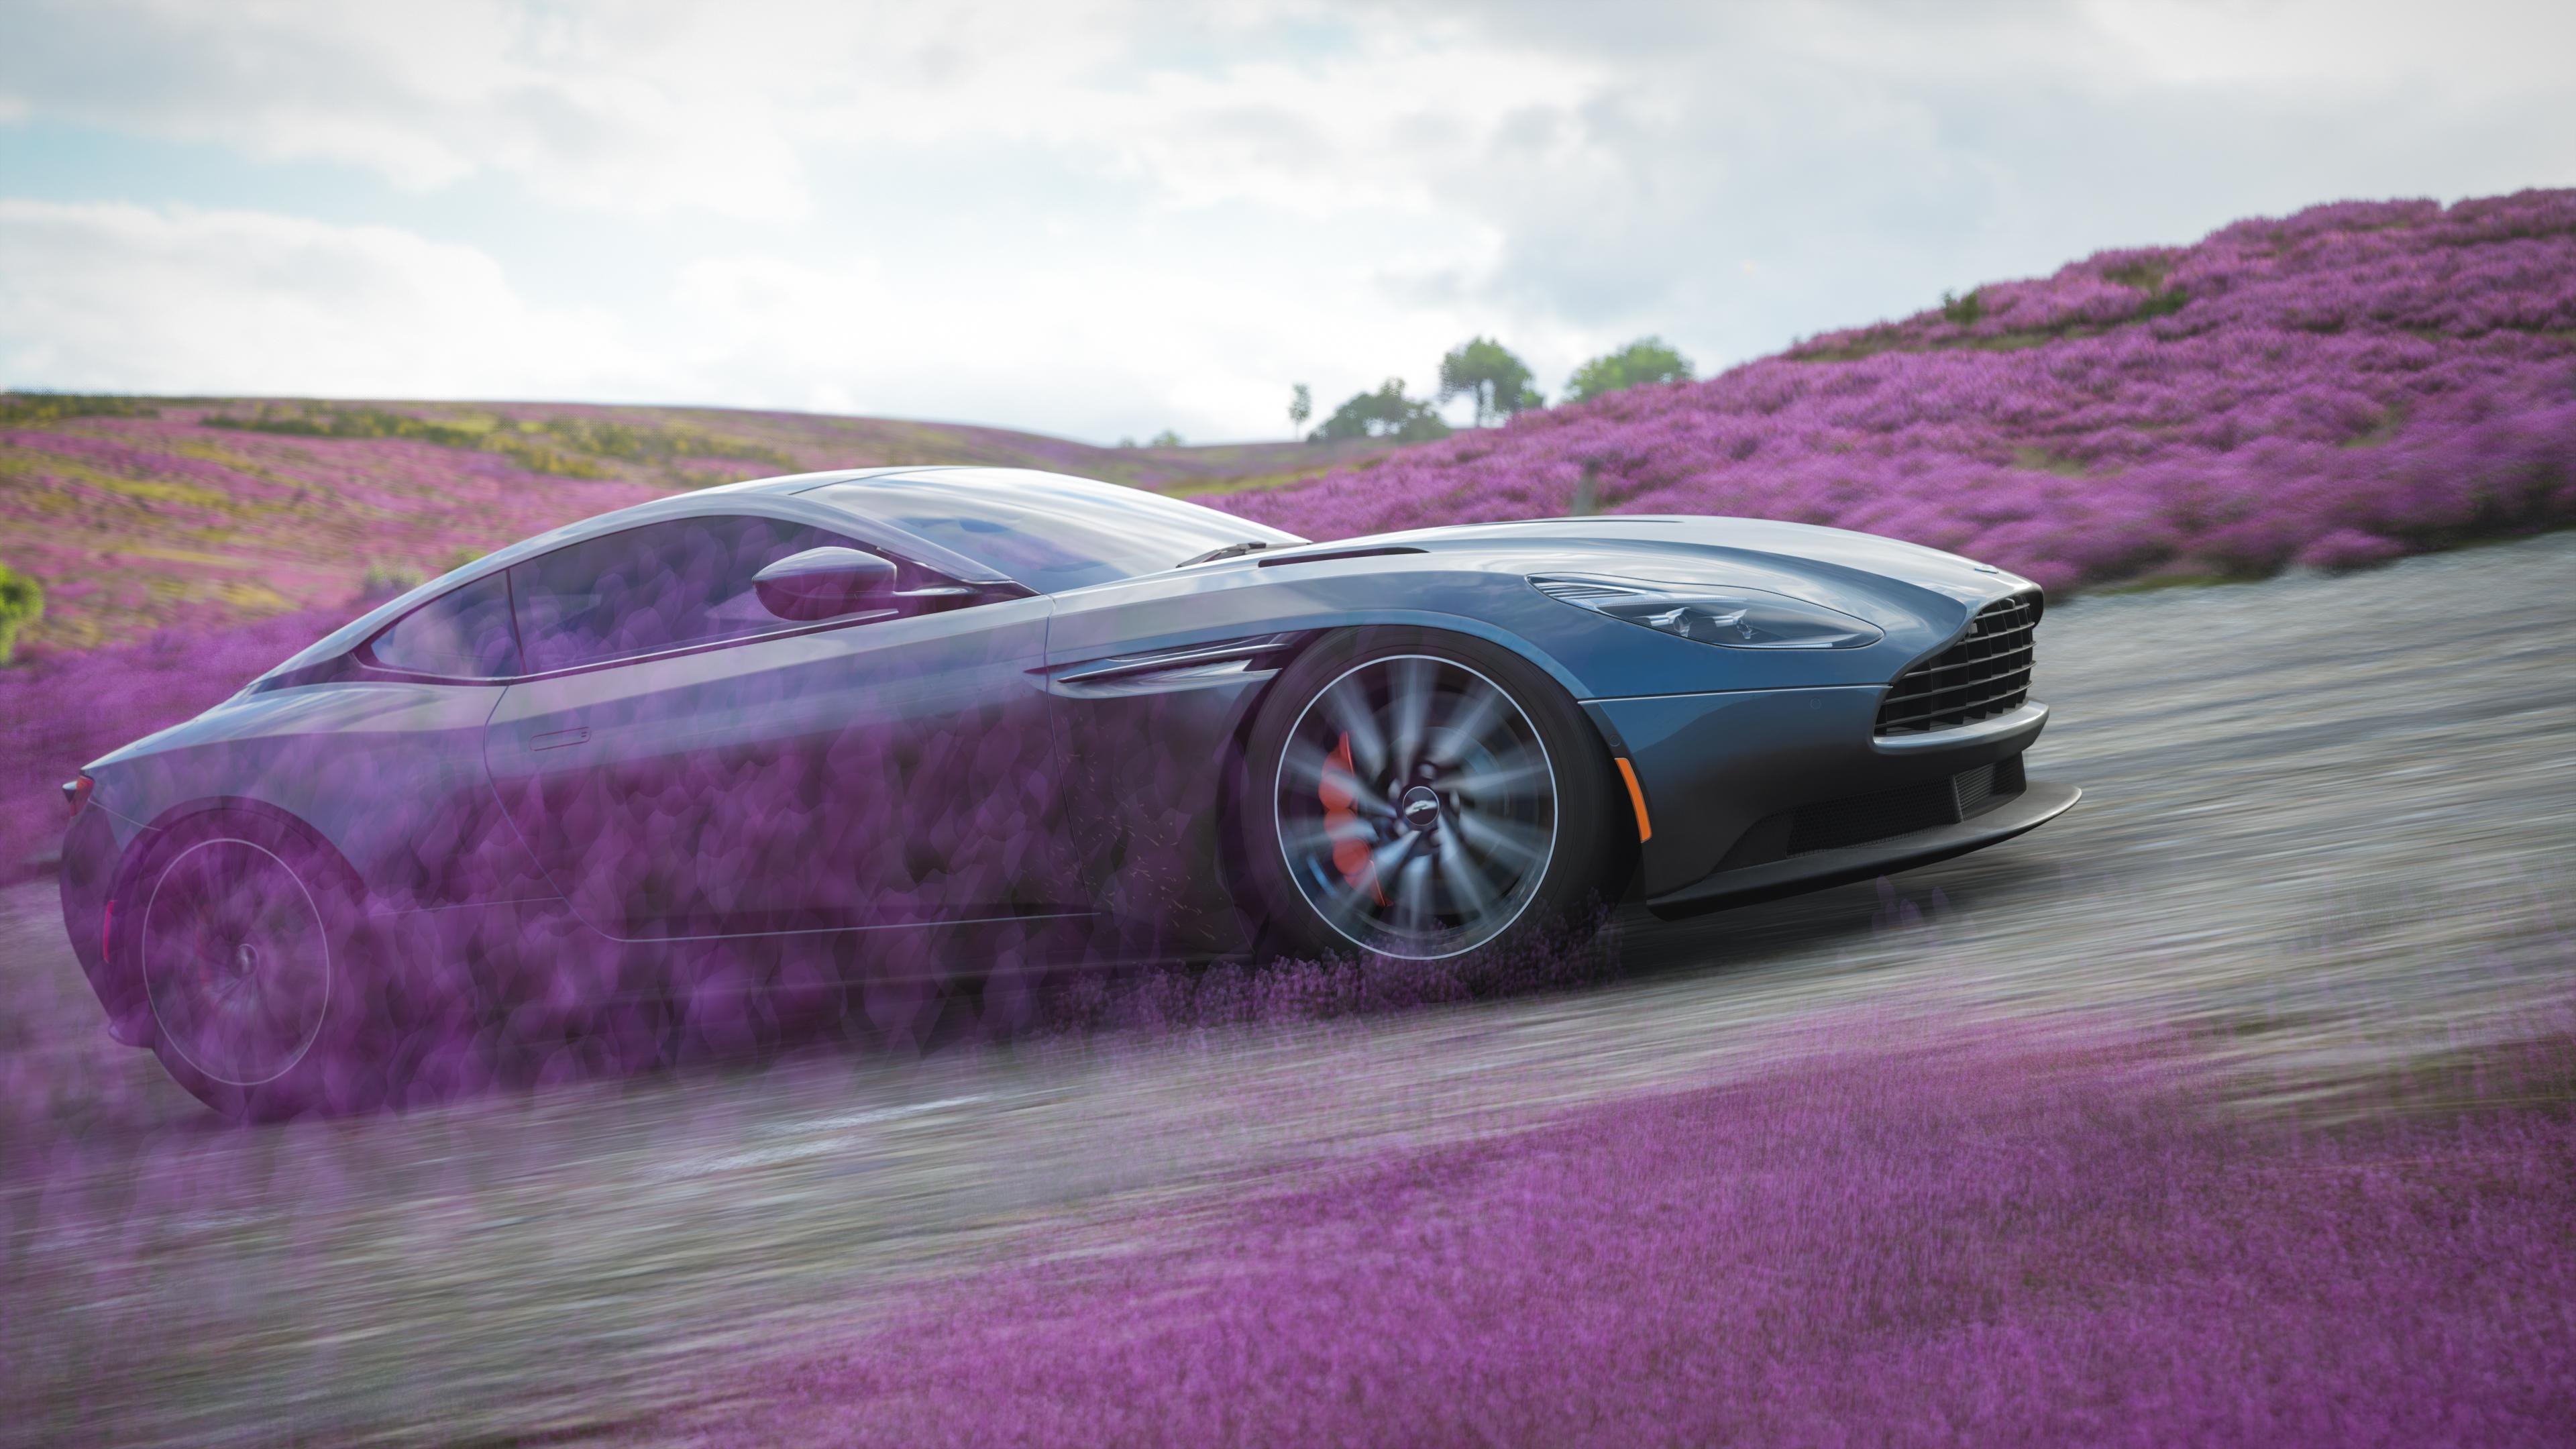 3840x2160 Aston Martin Db11 Forza Horizon 4 4k Hd 4k